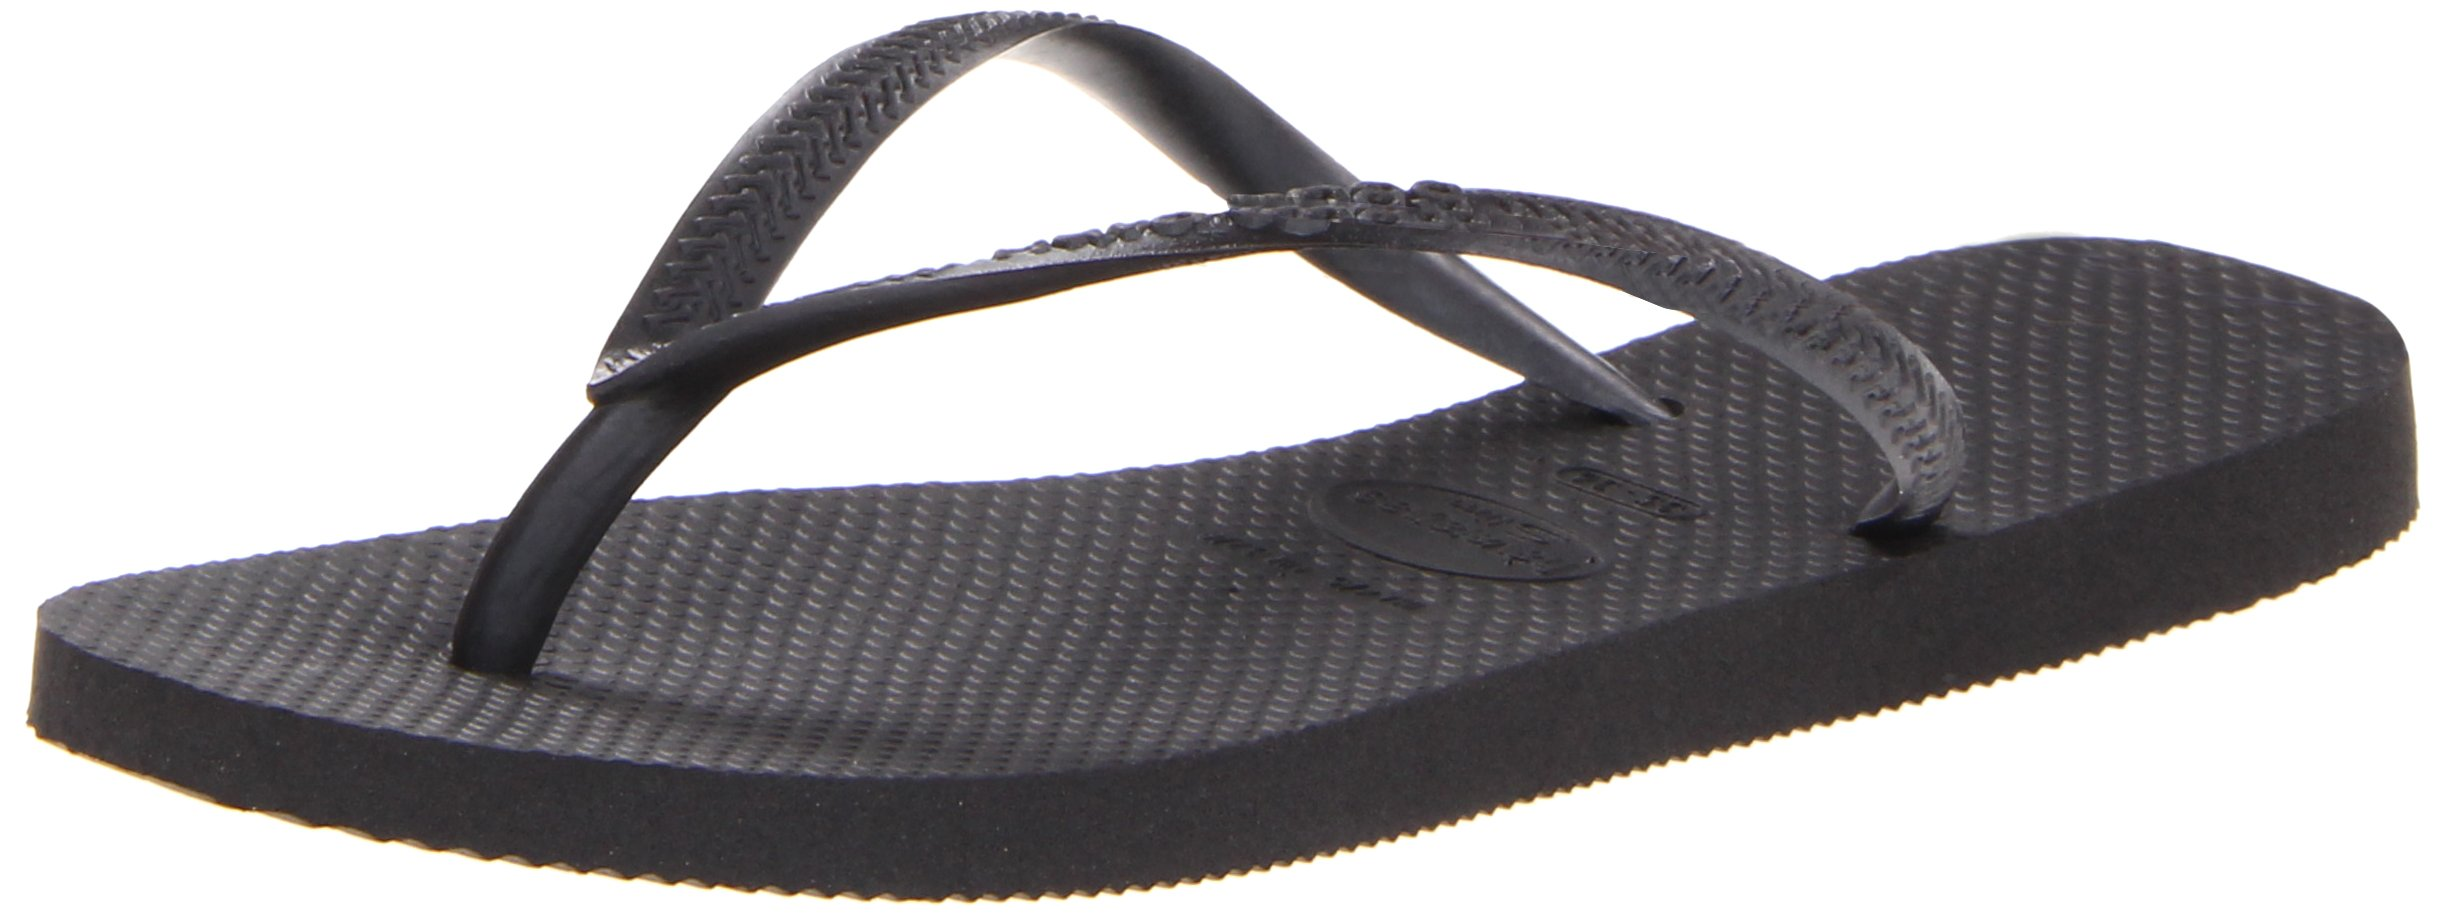 Havaianas Women's Slim Flip Flop Black 37/38 Br/7-8M Us 14